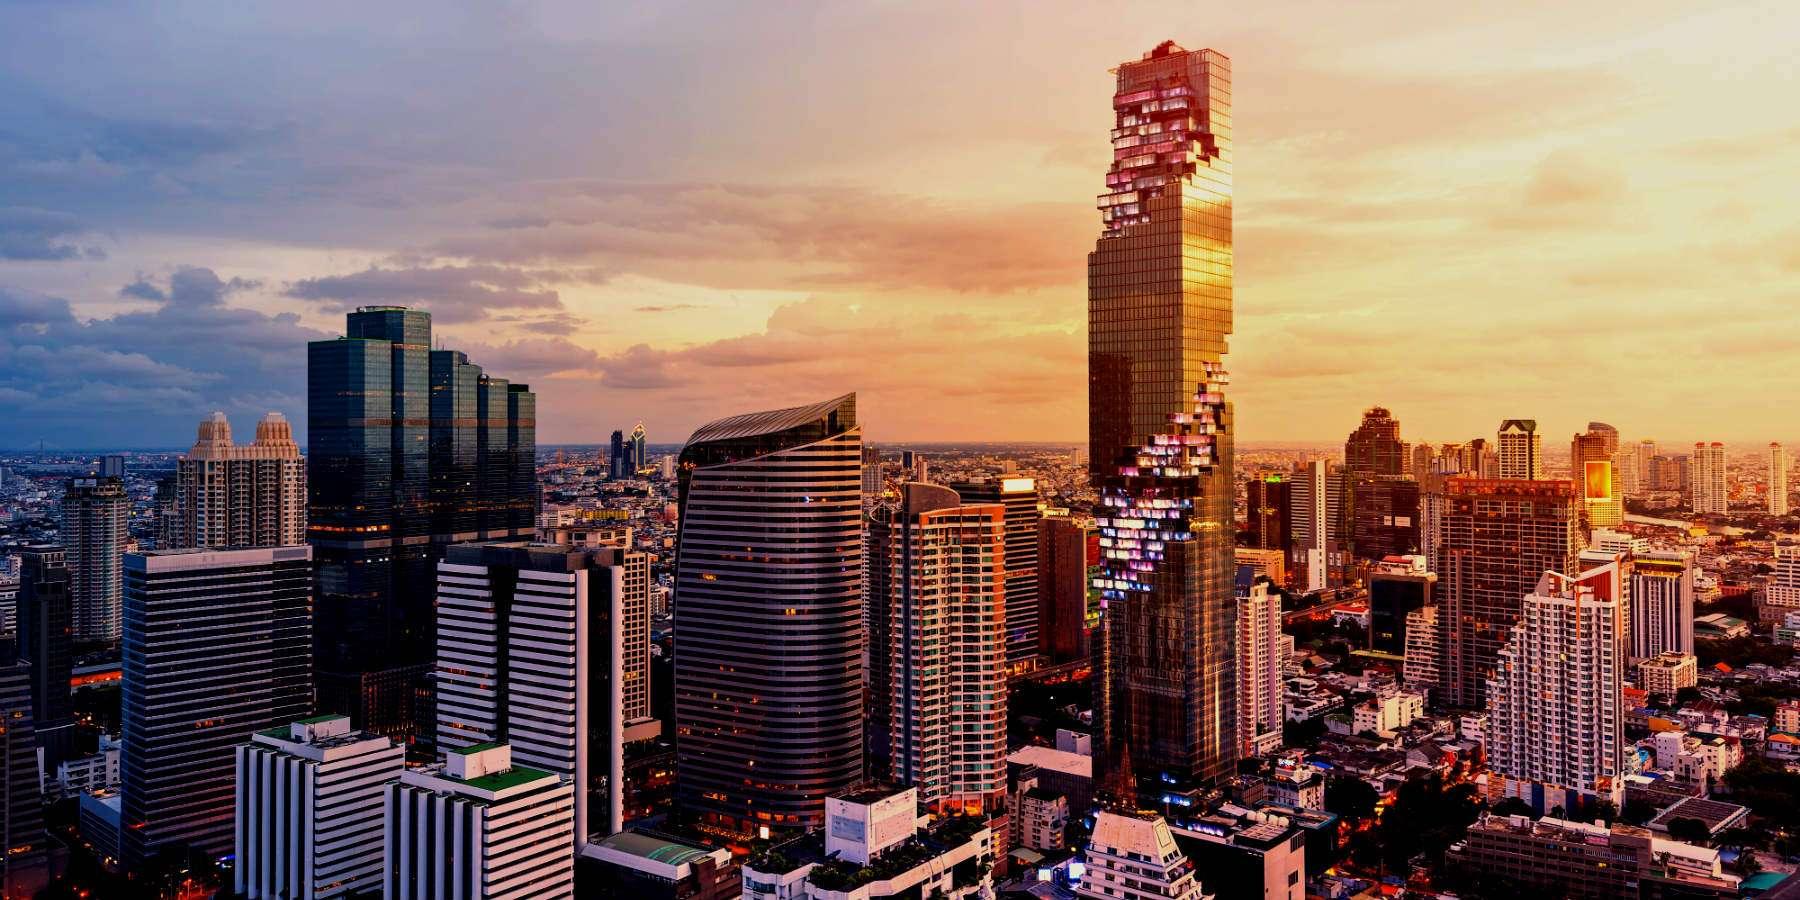 Exterior King Power Mahanakhon from far away, the pixel tower in Bangkok